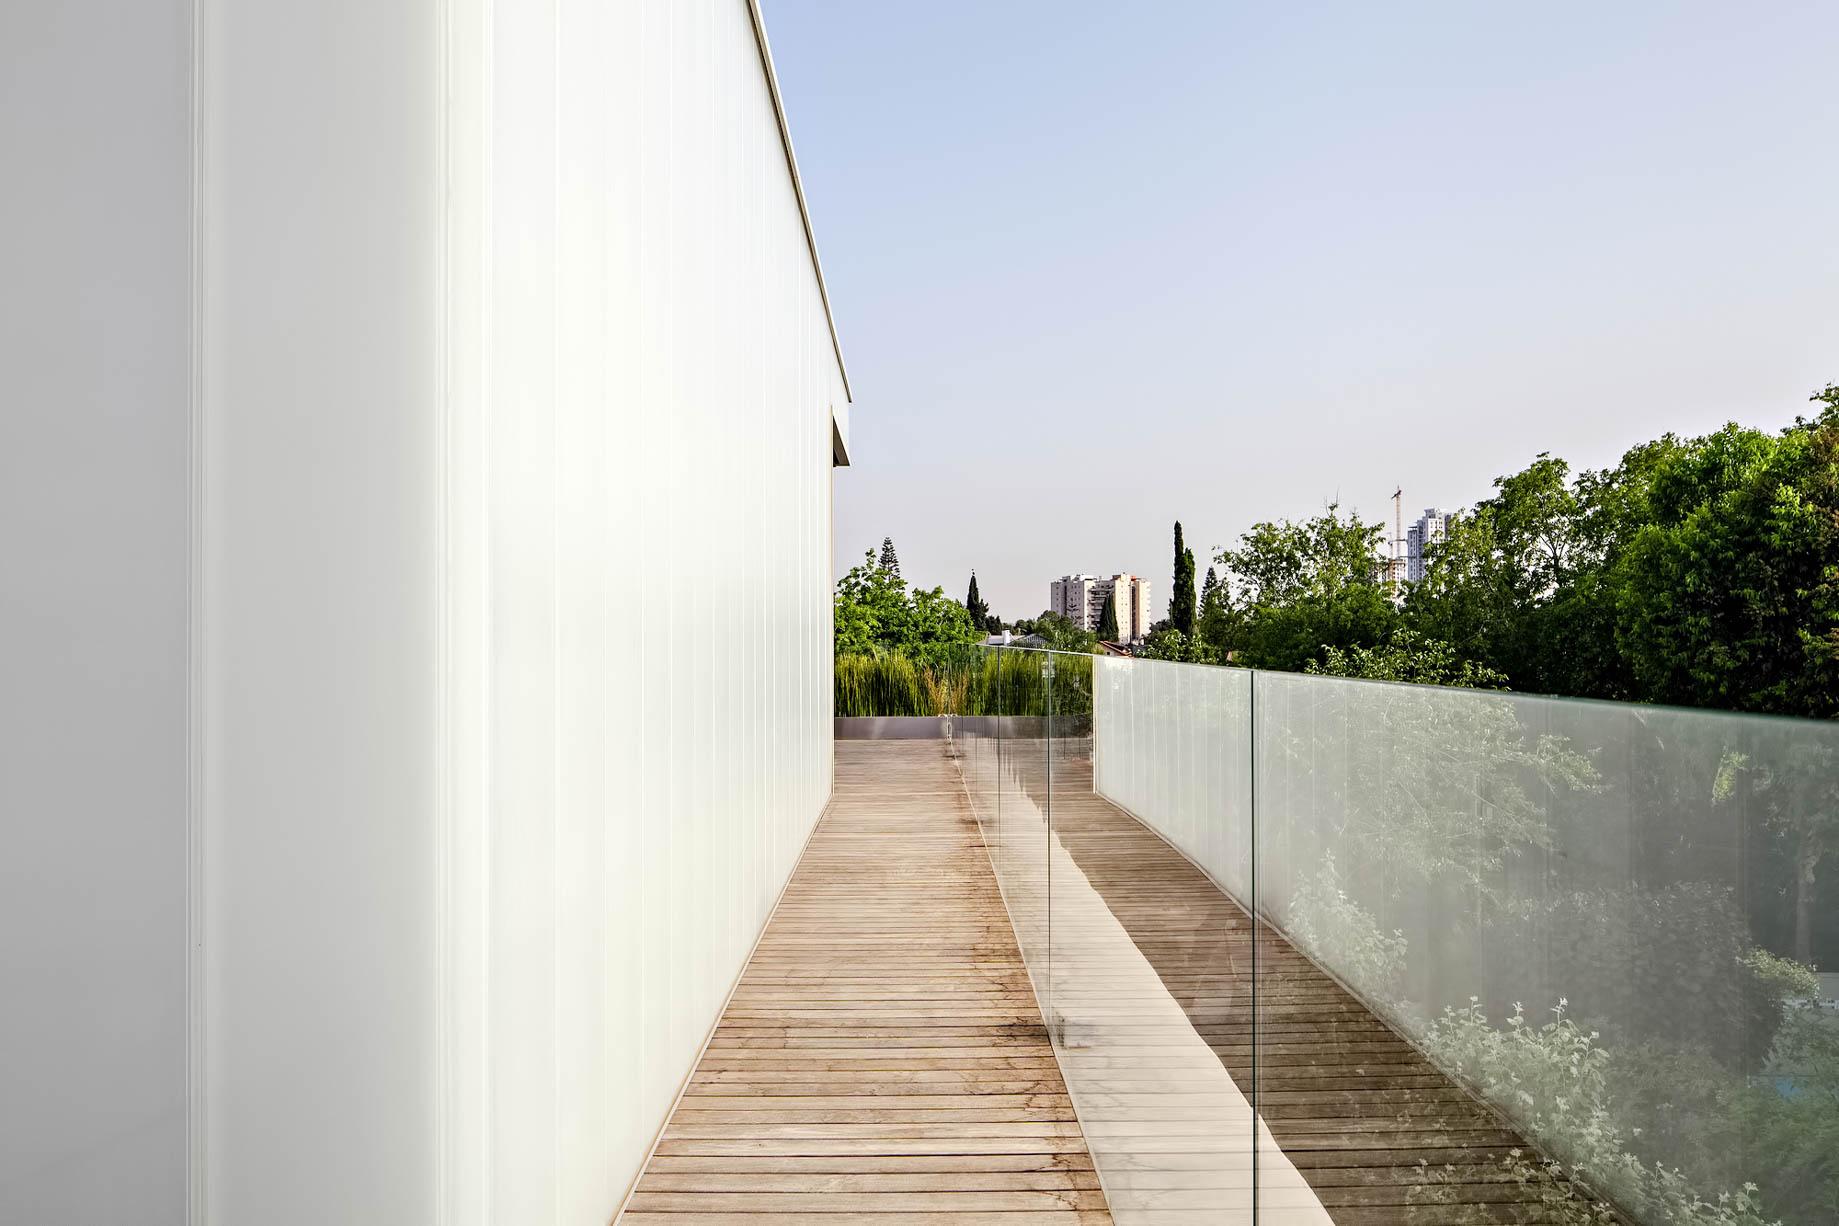 Concrete Cut Luxury Residence – Ramat Gan, Tel Aviv, IsraelConcrete Cut Luxury Residence – Ramat Gan, Tel Aviv, Israel